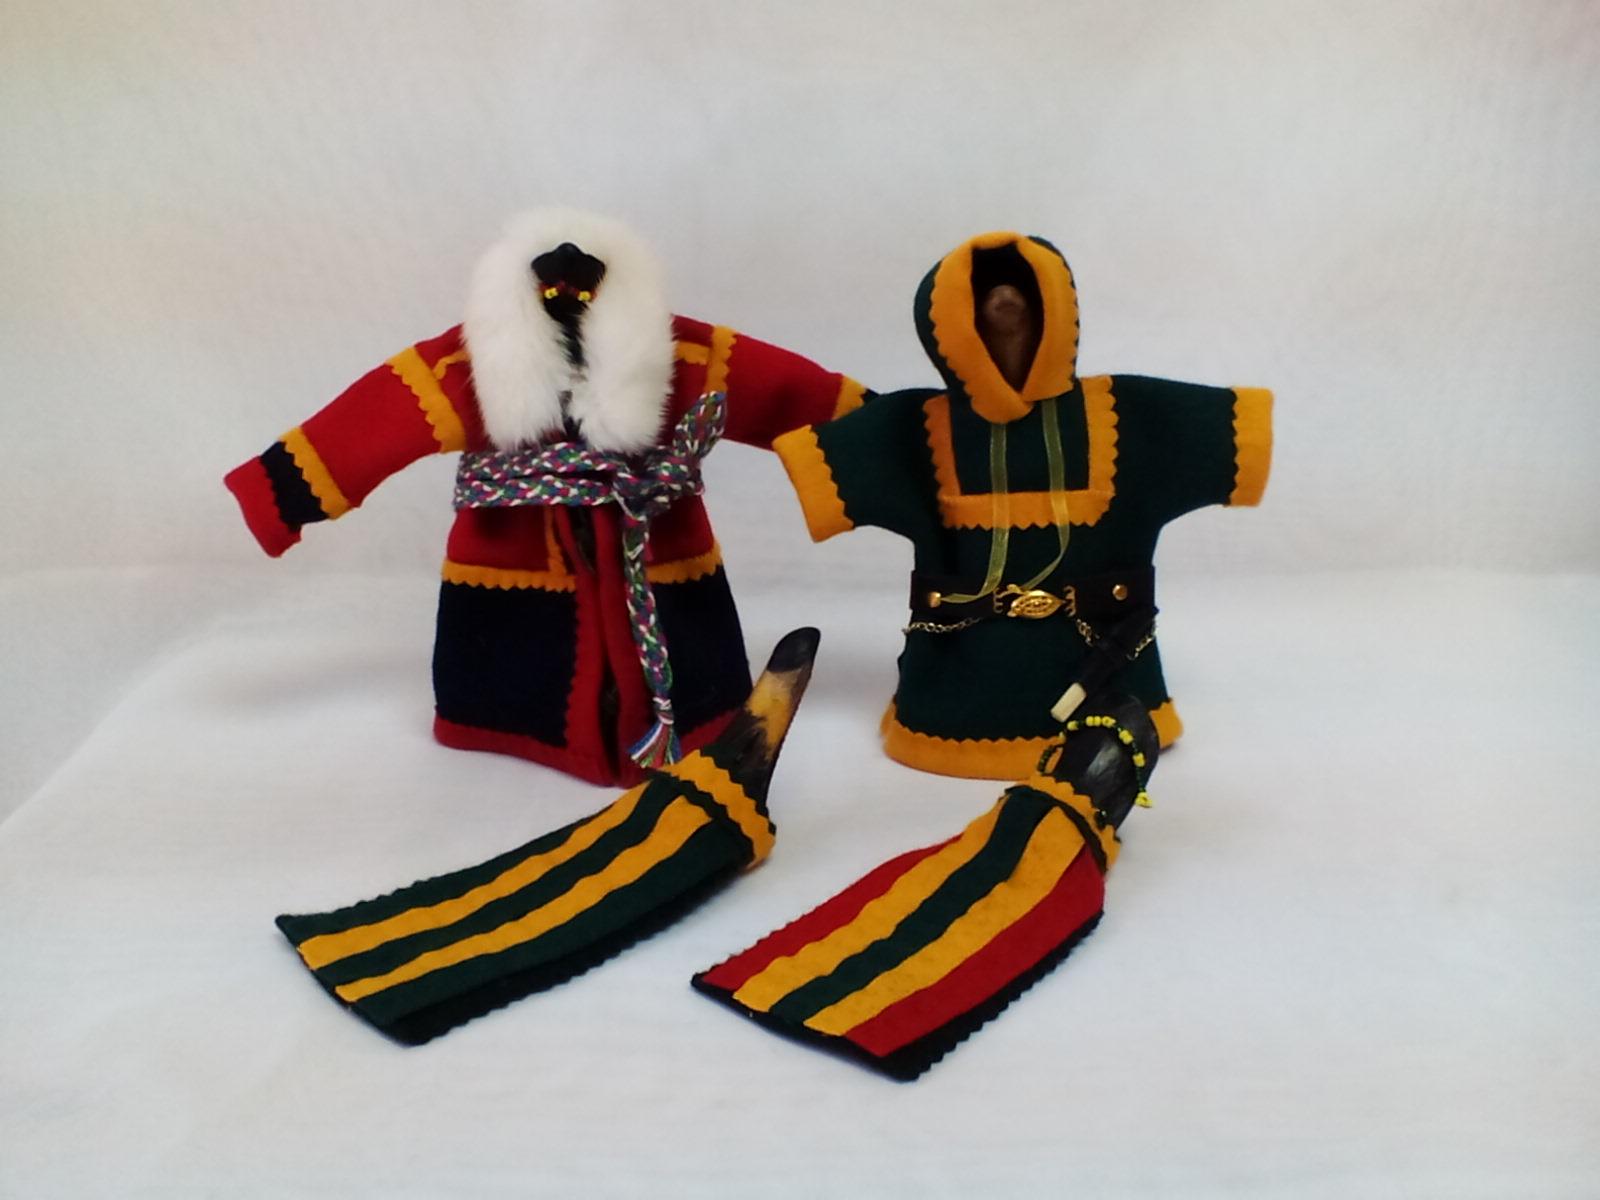 Ненецкий сувенир своими руками